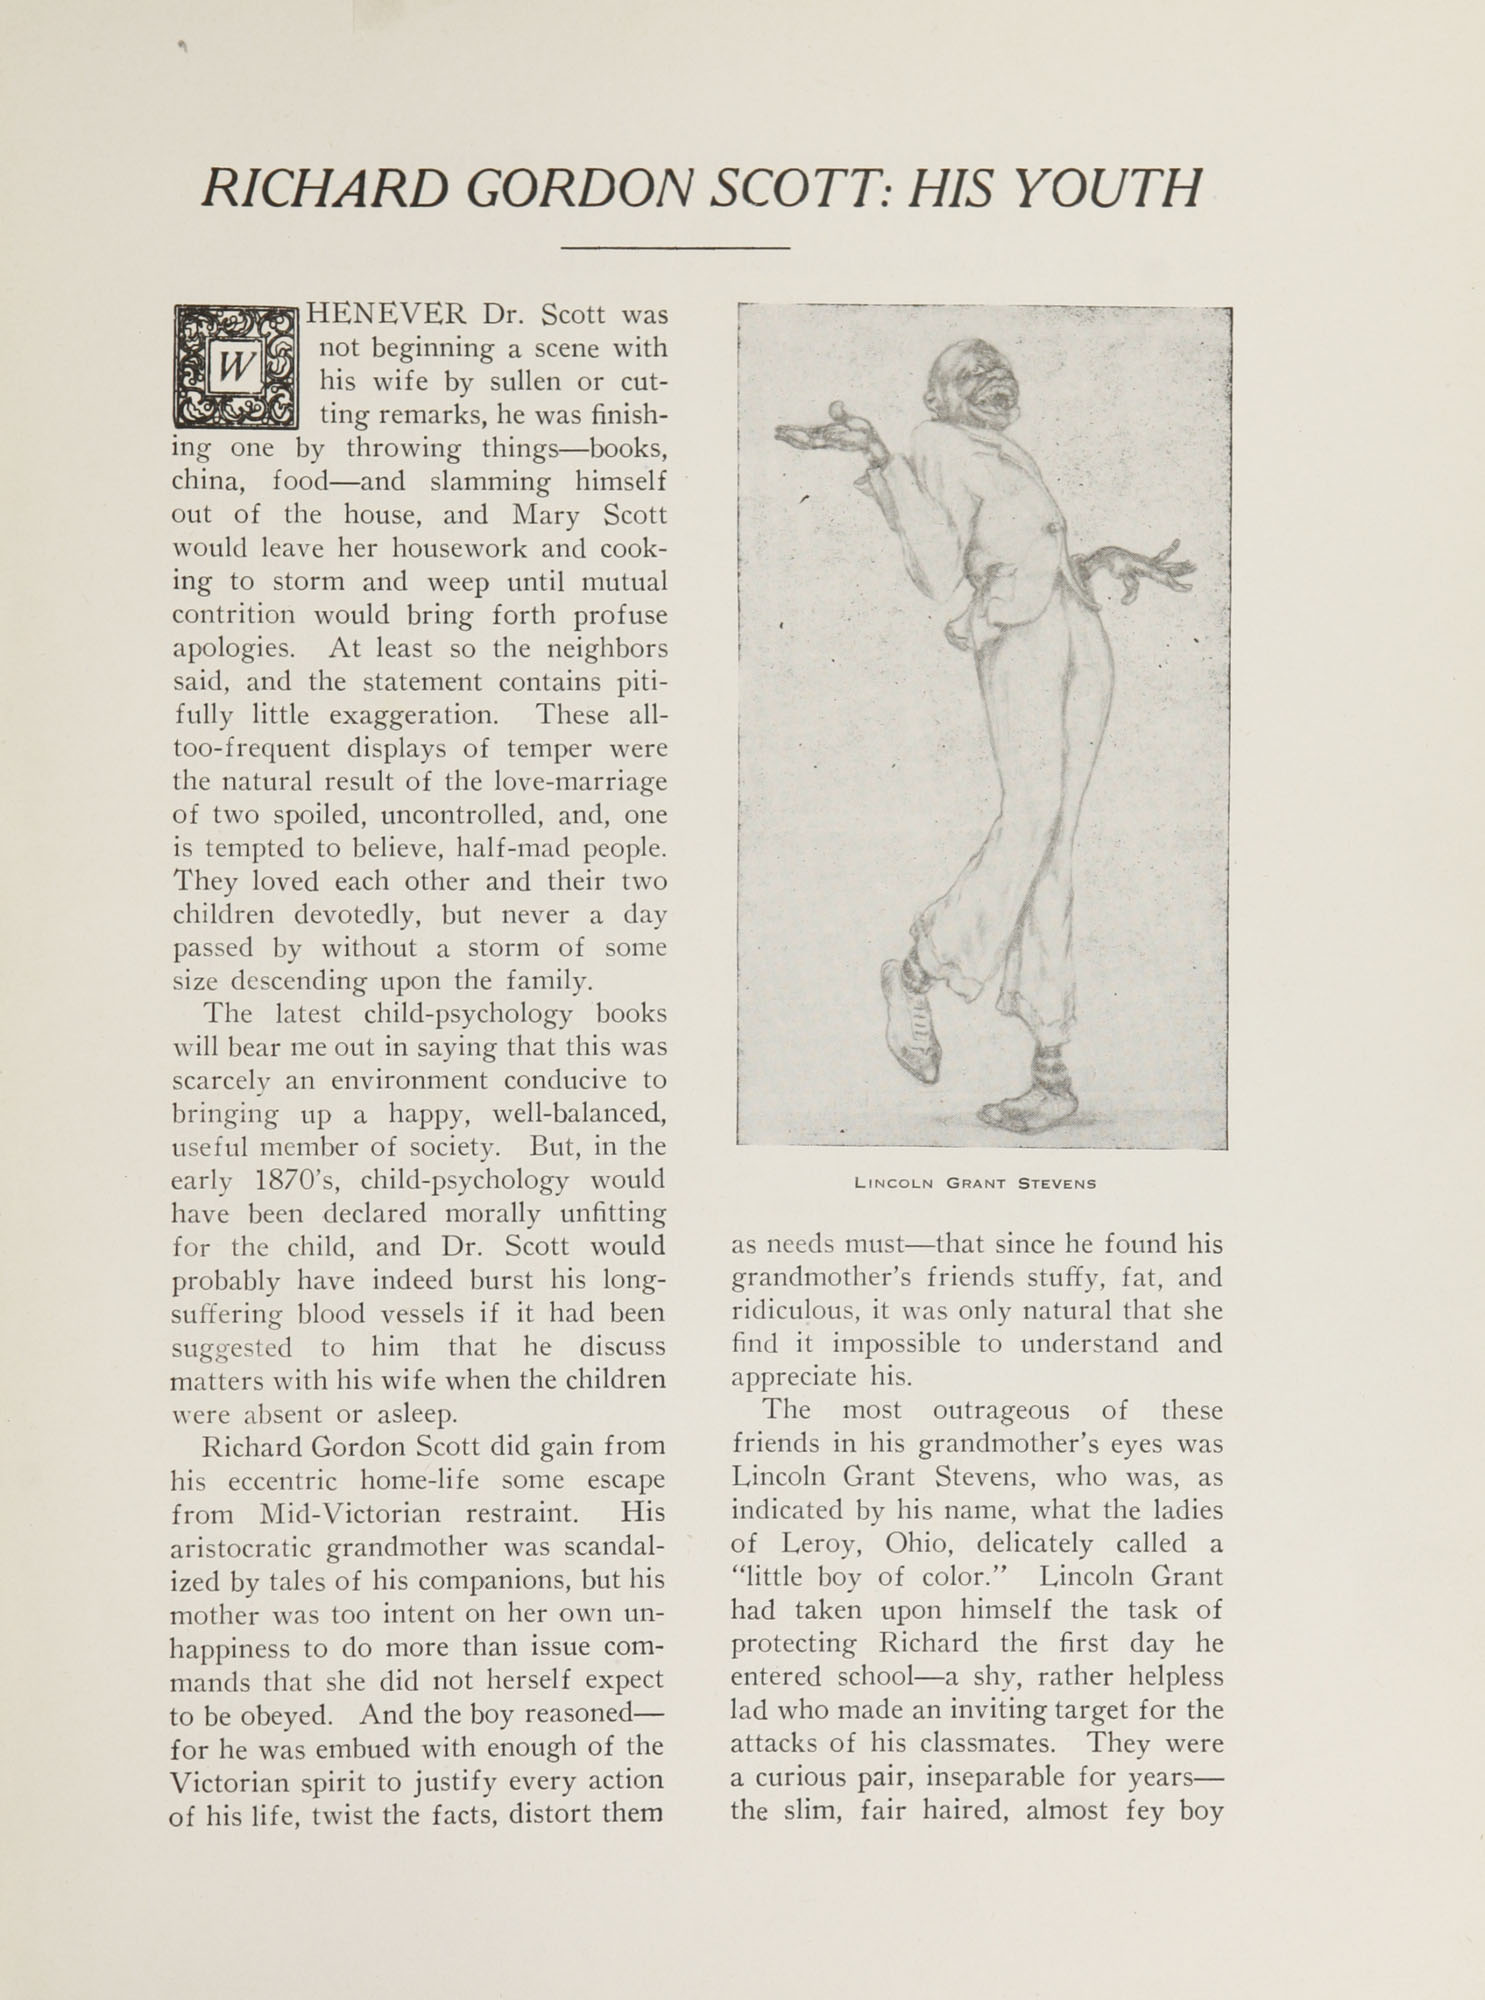 College of Charleston Magazine, 1937-1938, Vol. XXXXI No. 1, page 3